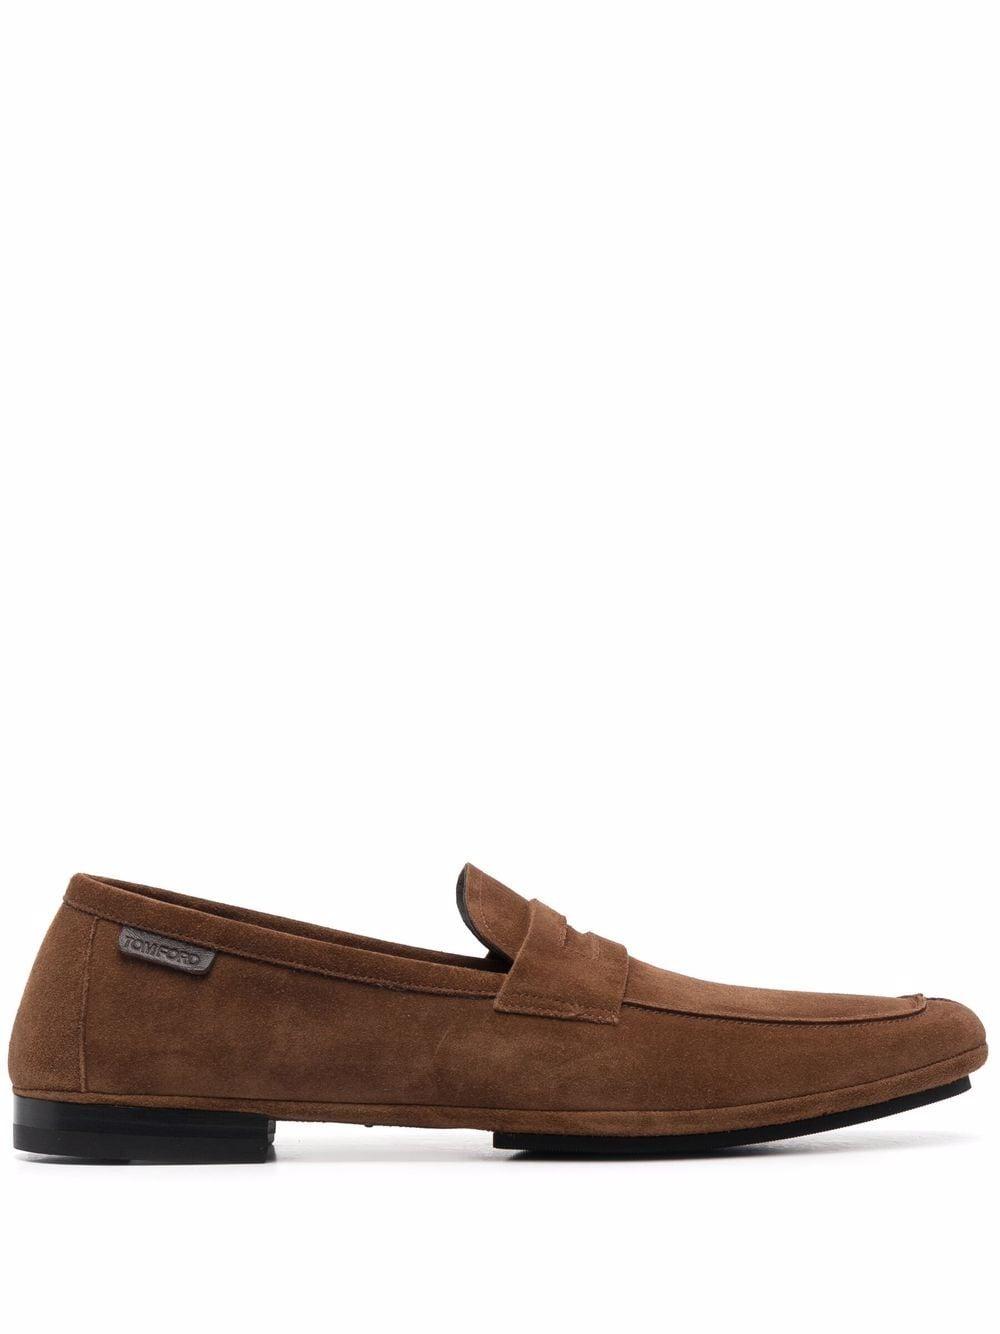 TOM FORD almond toe logo tab loafers - Braun